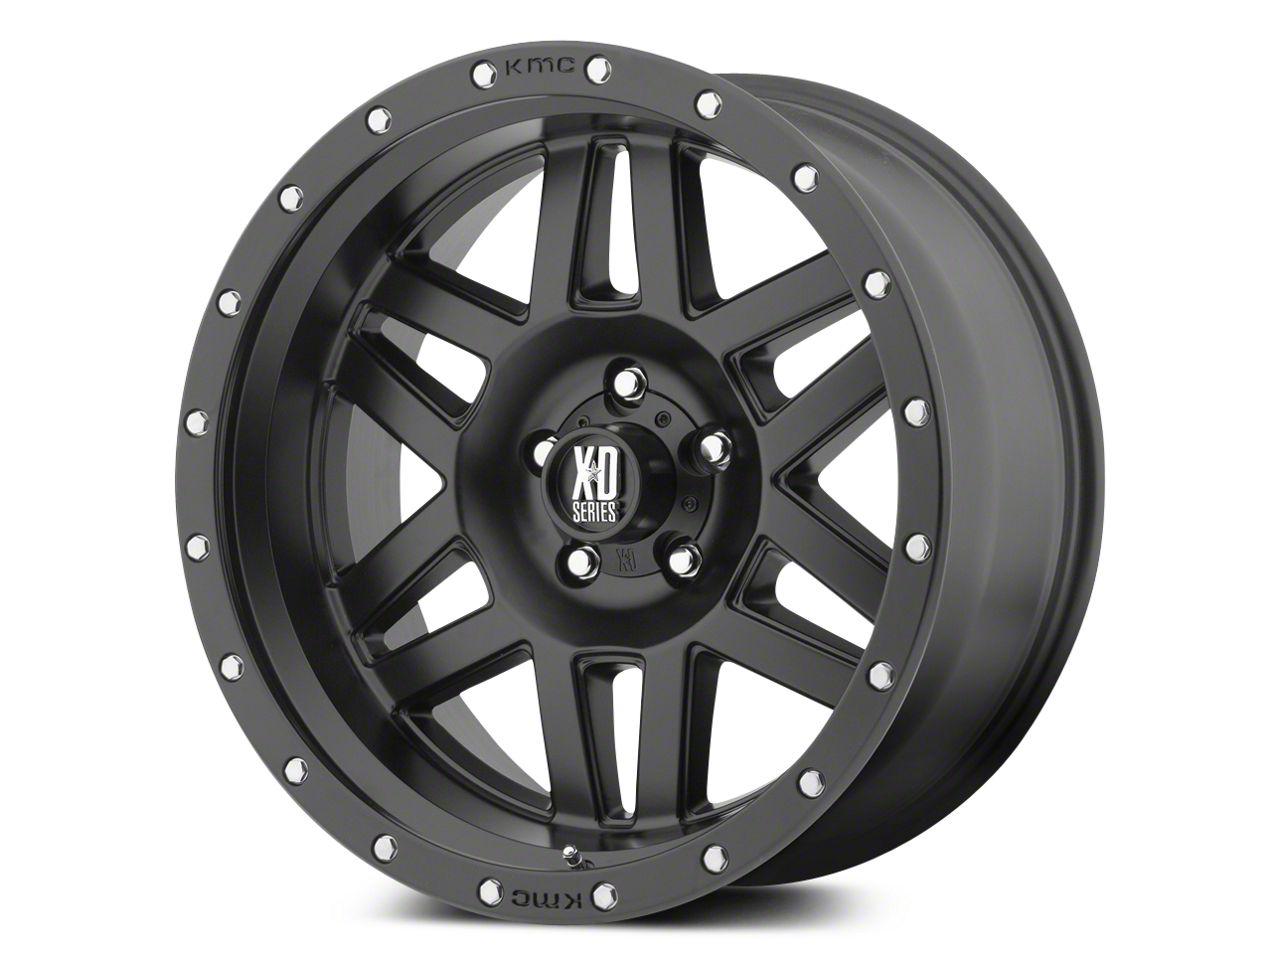 XD Machete Satin Black 5-Lug Wheel - 17x9 (02-18 RAM 1500, Excluding Mega Cab)